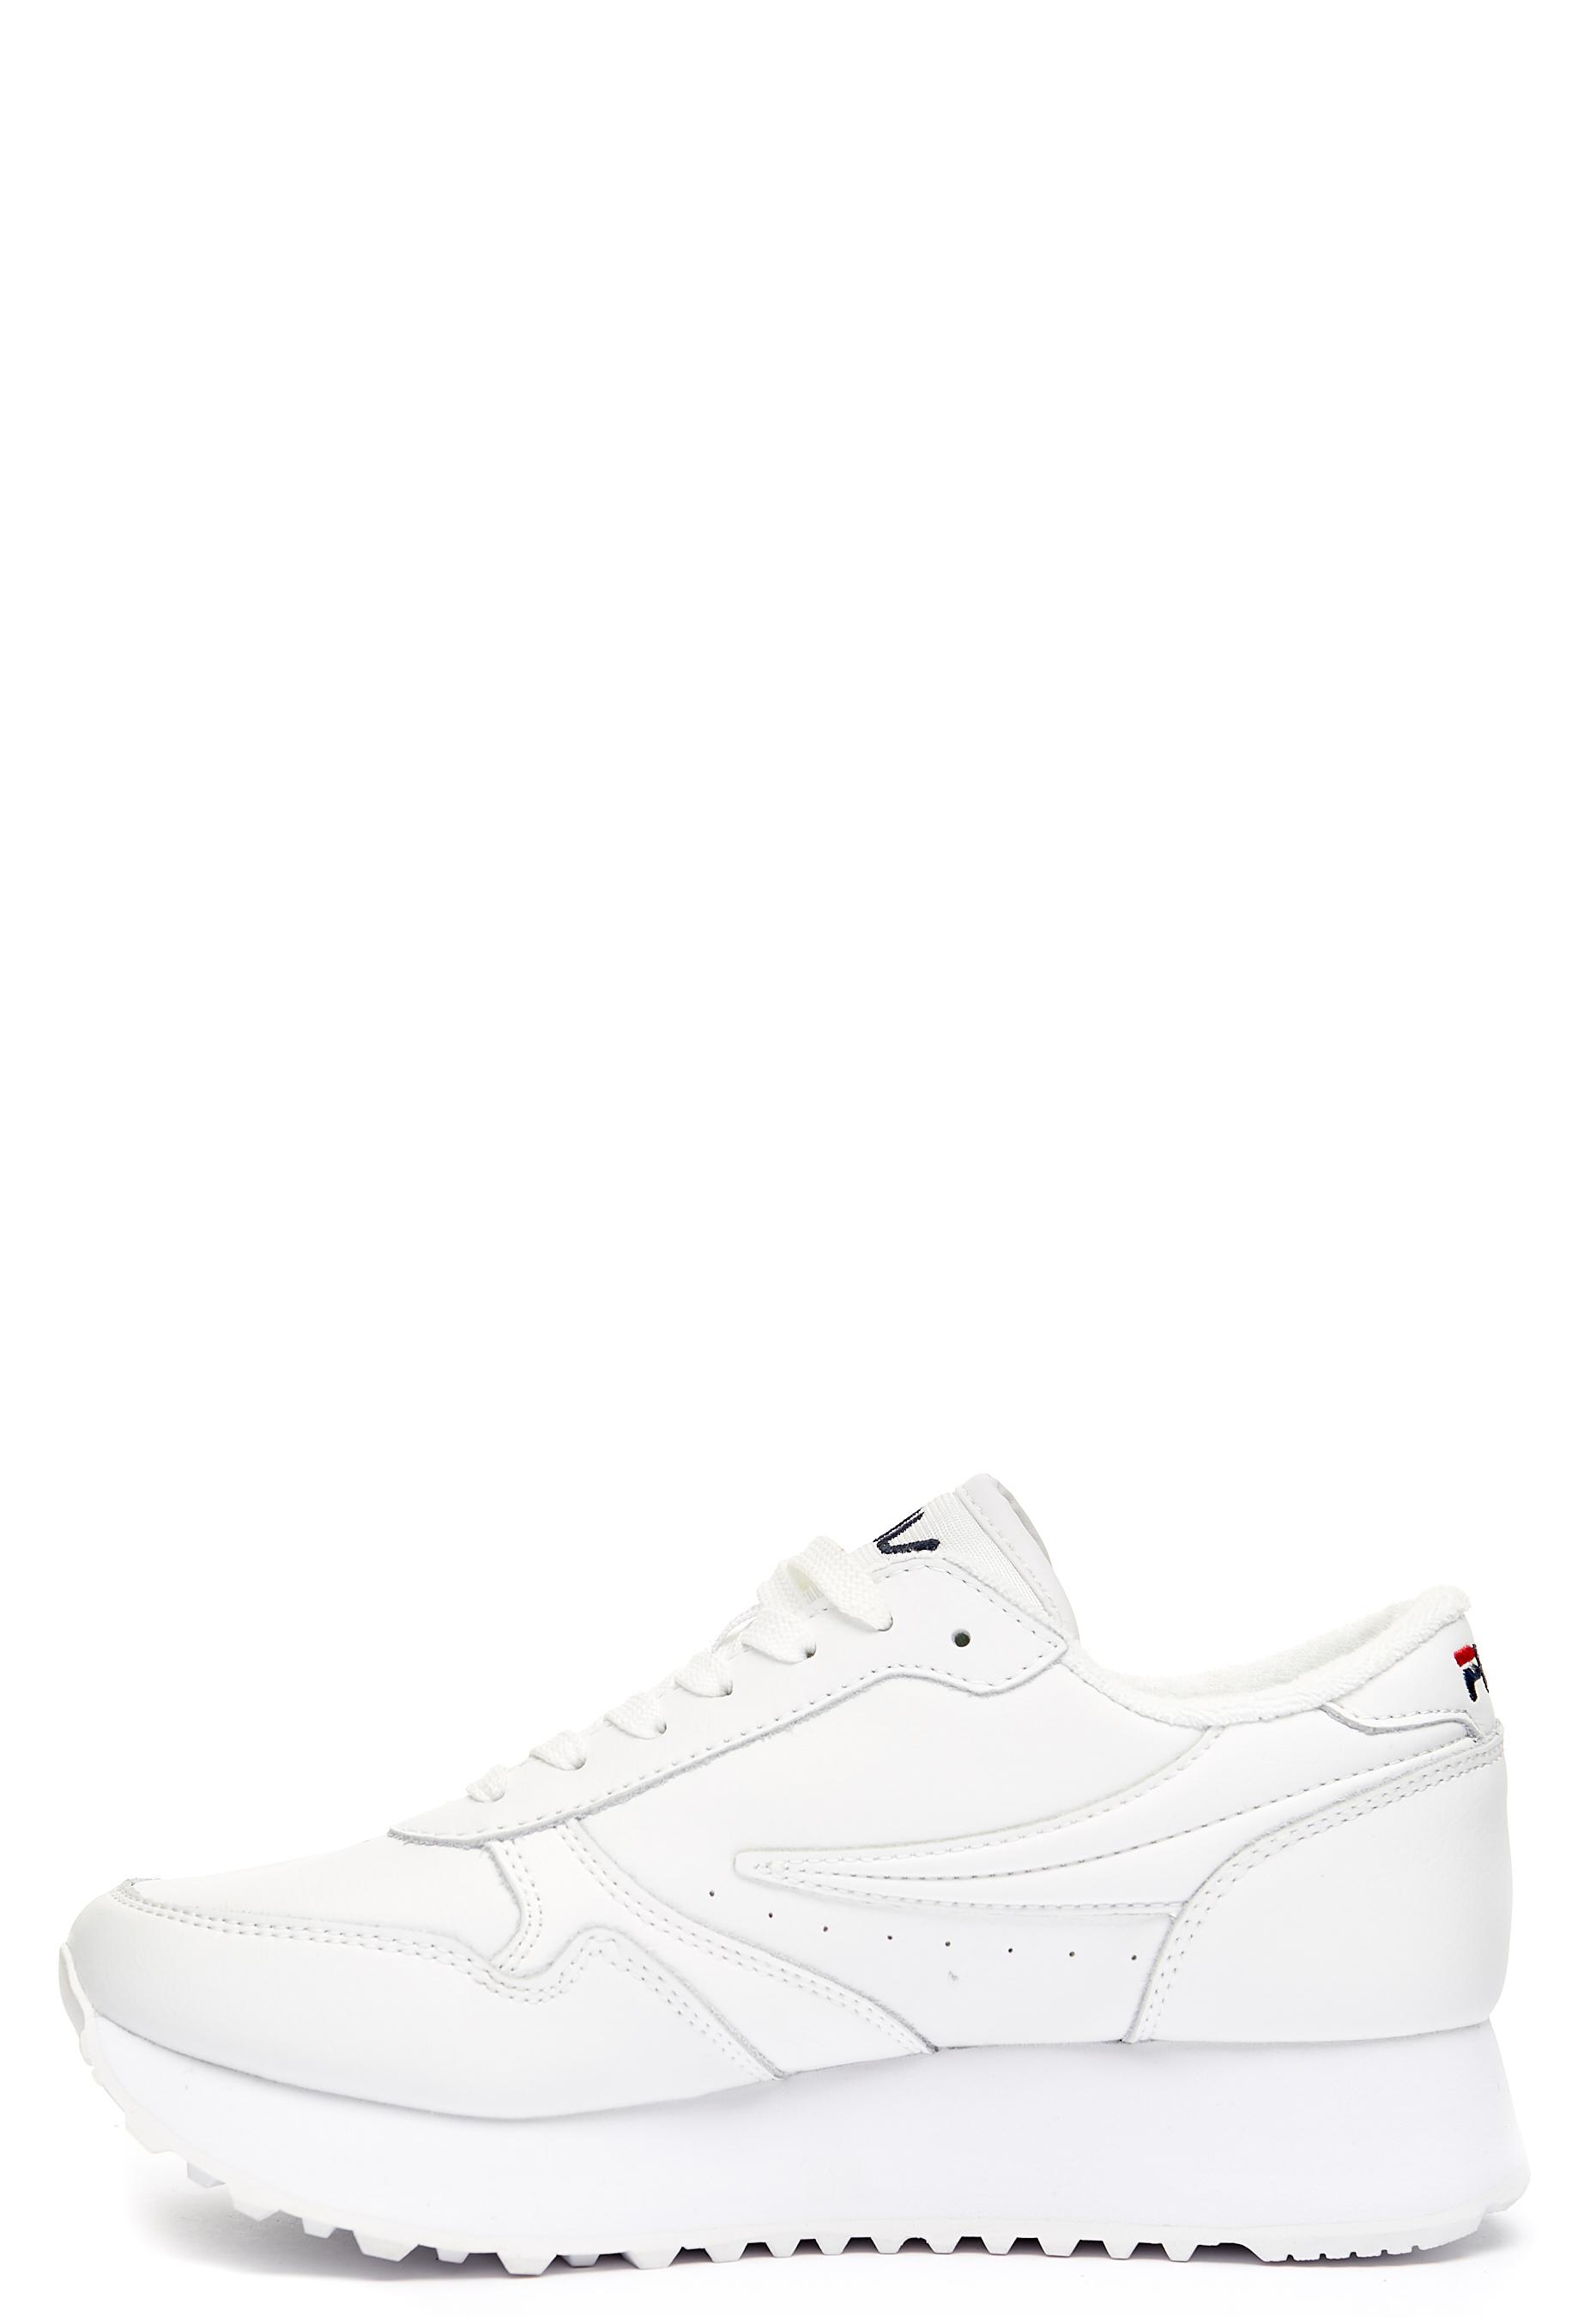 e99381066fe FILA Orbit Zeppa L Shoes White - Bubbleroom